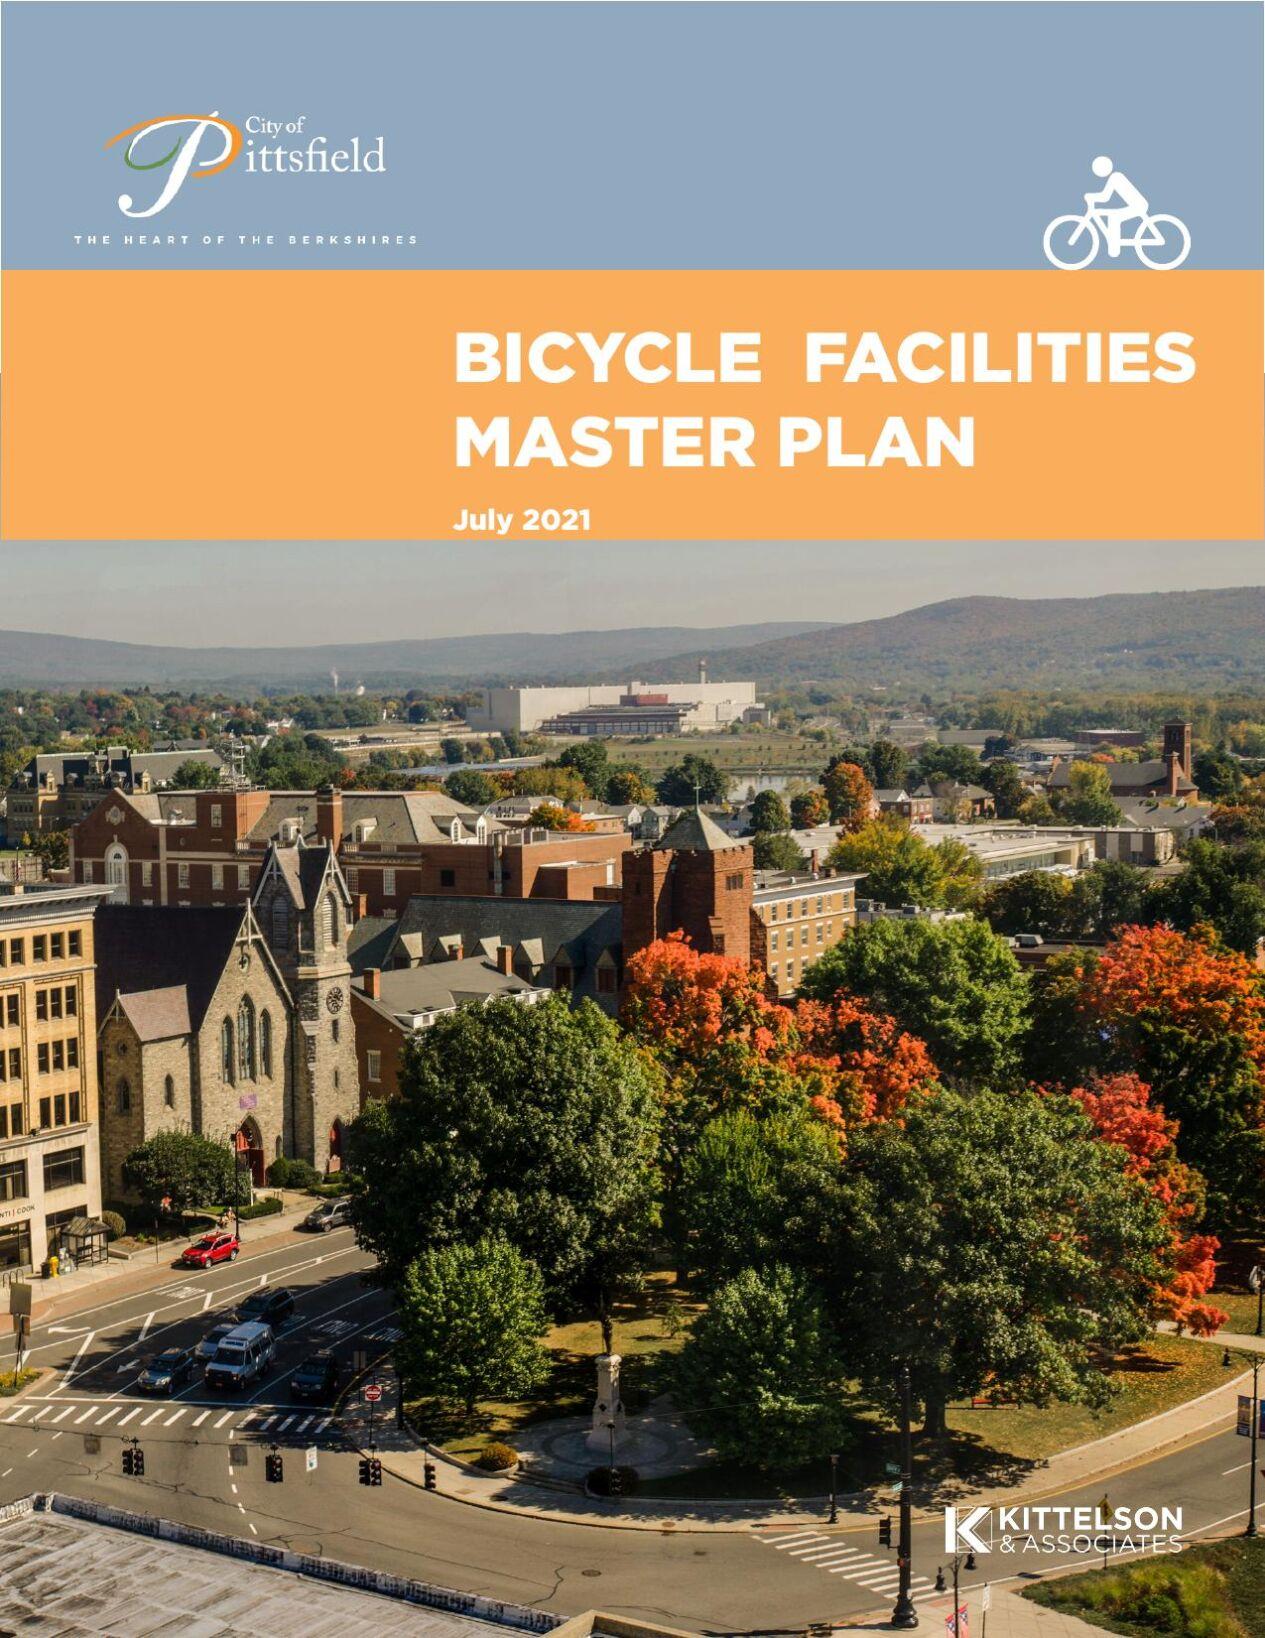 Bicycle Facilities Master Plan